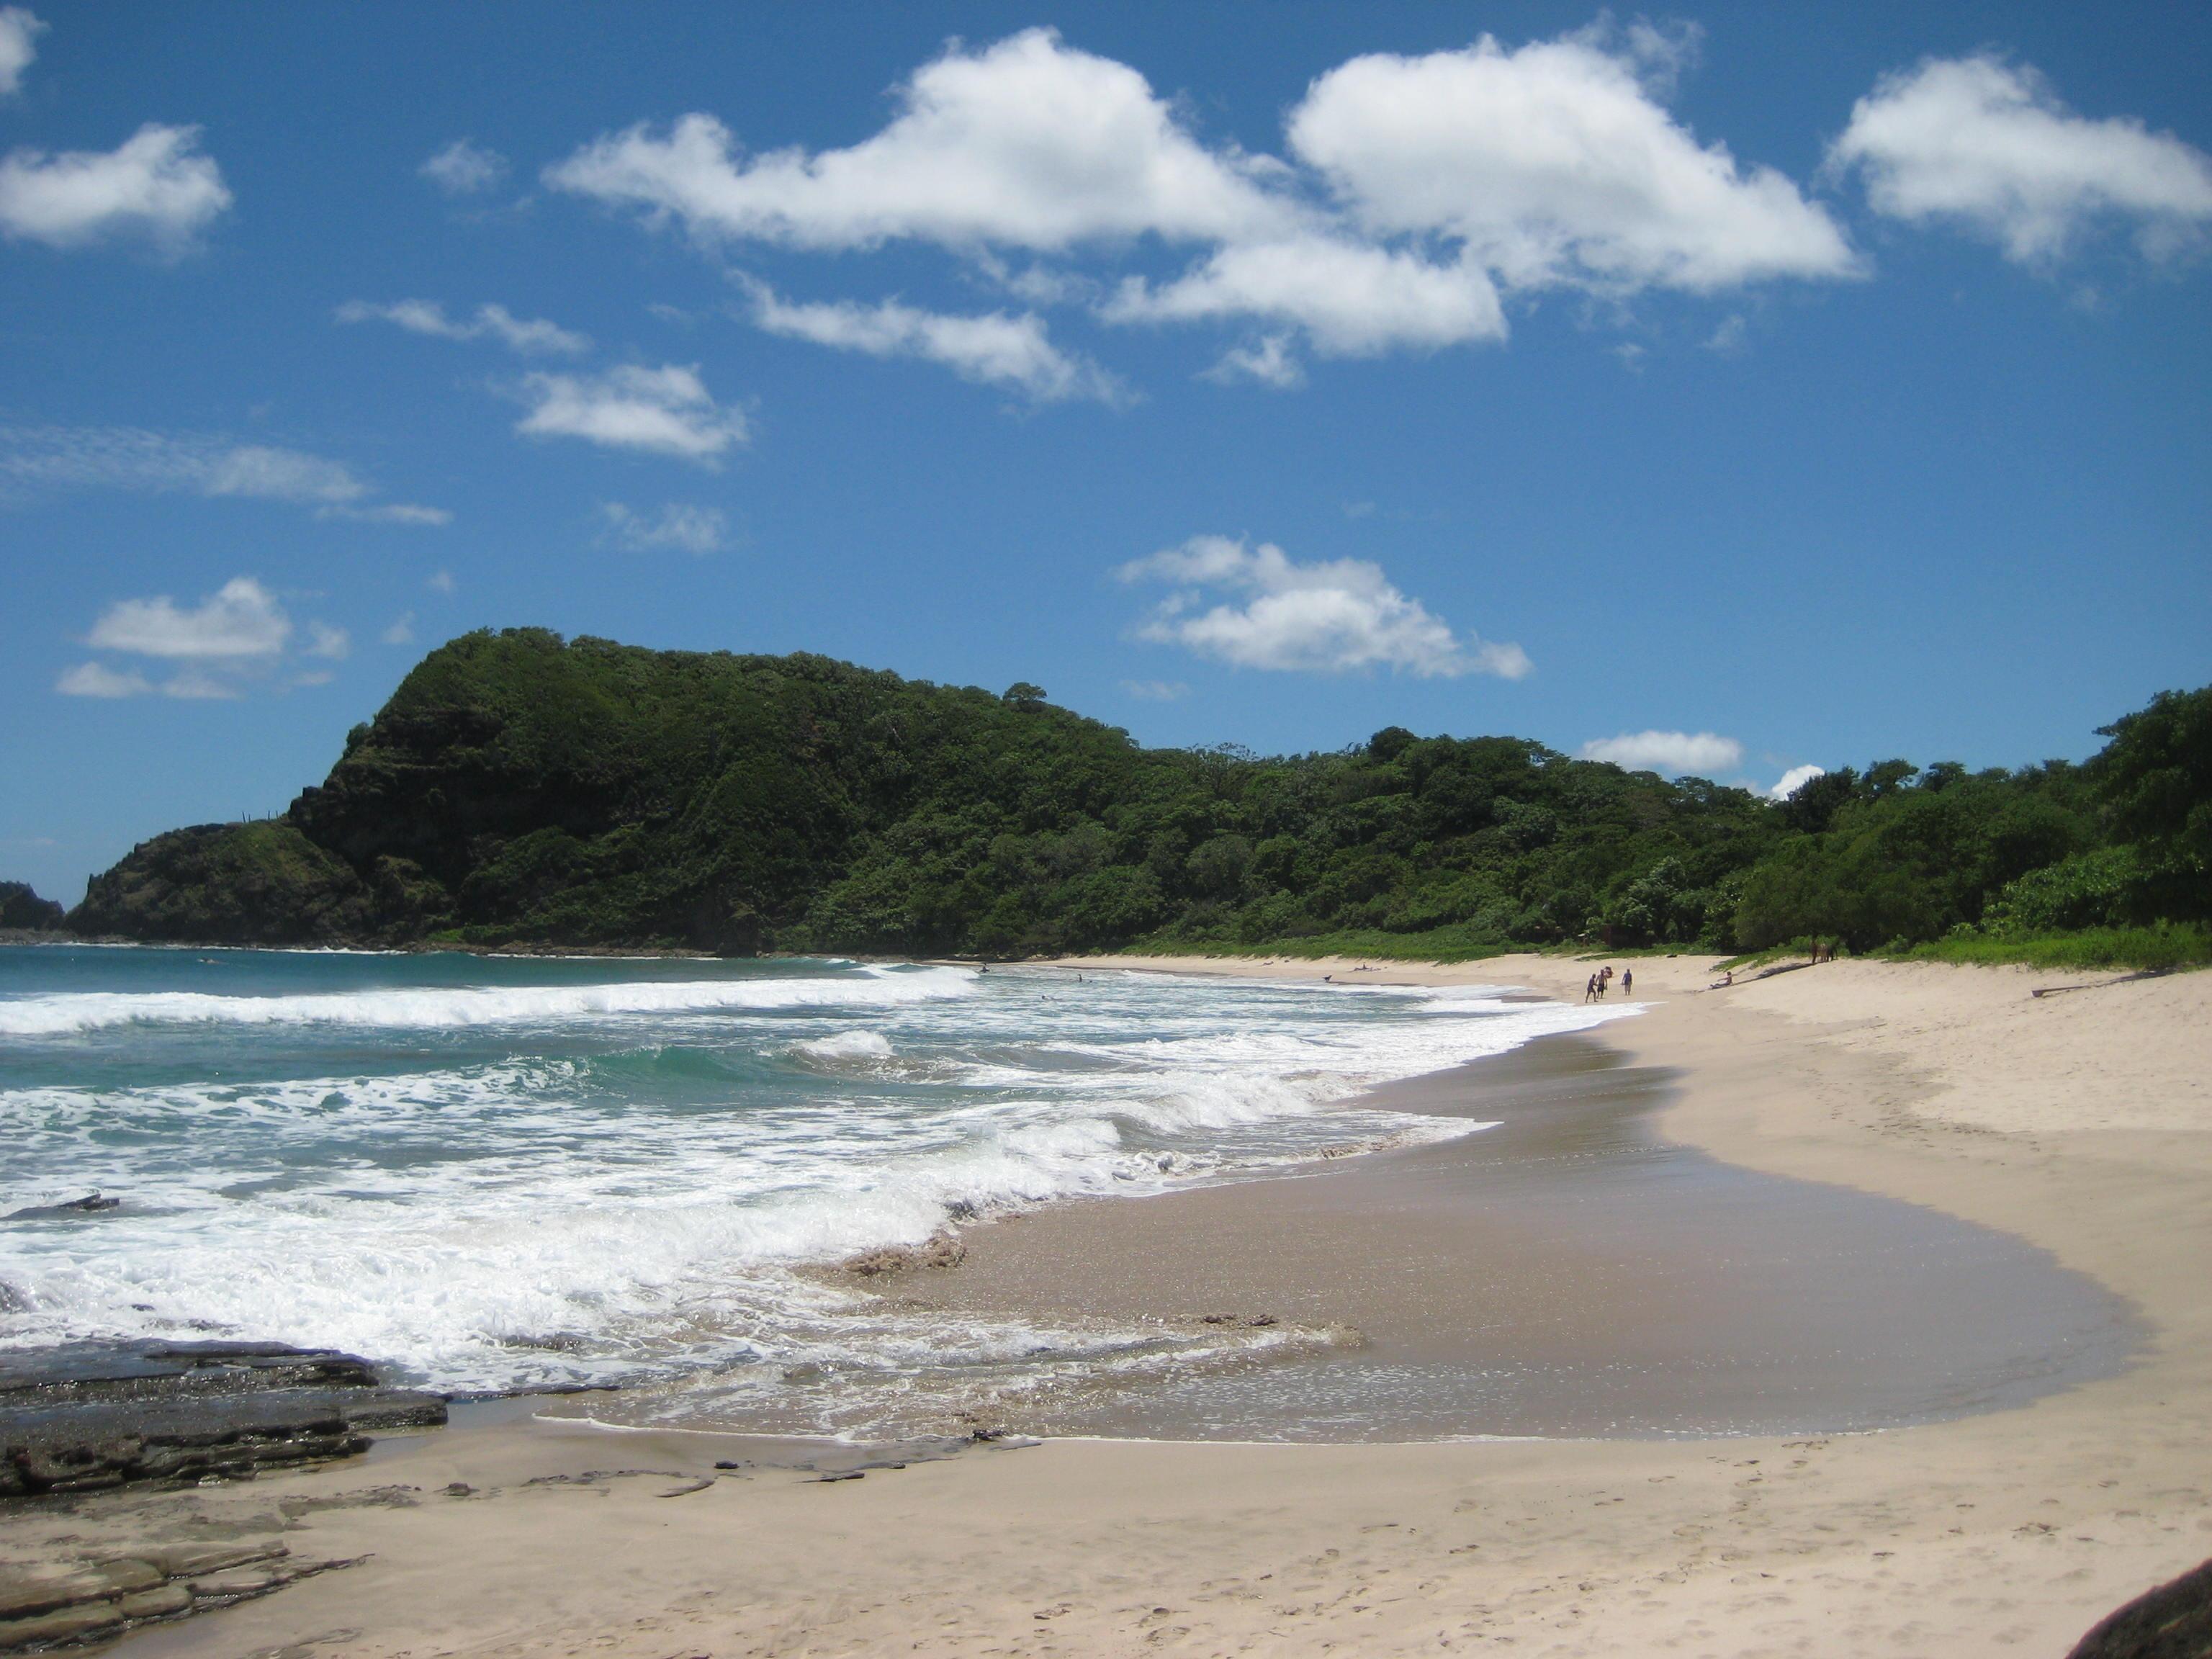 Hitting the beach san juan del sur nicaragua travel for Encimeras del sur